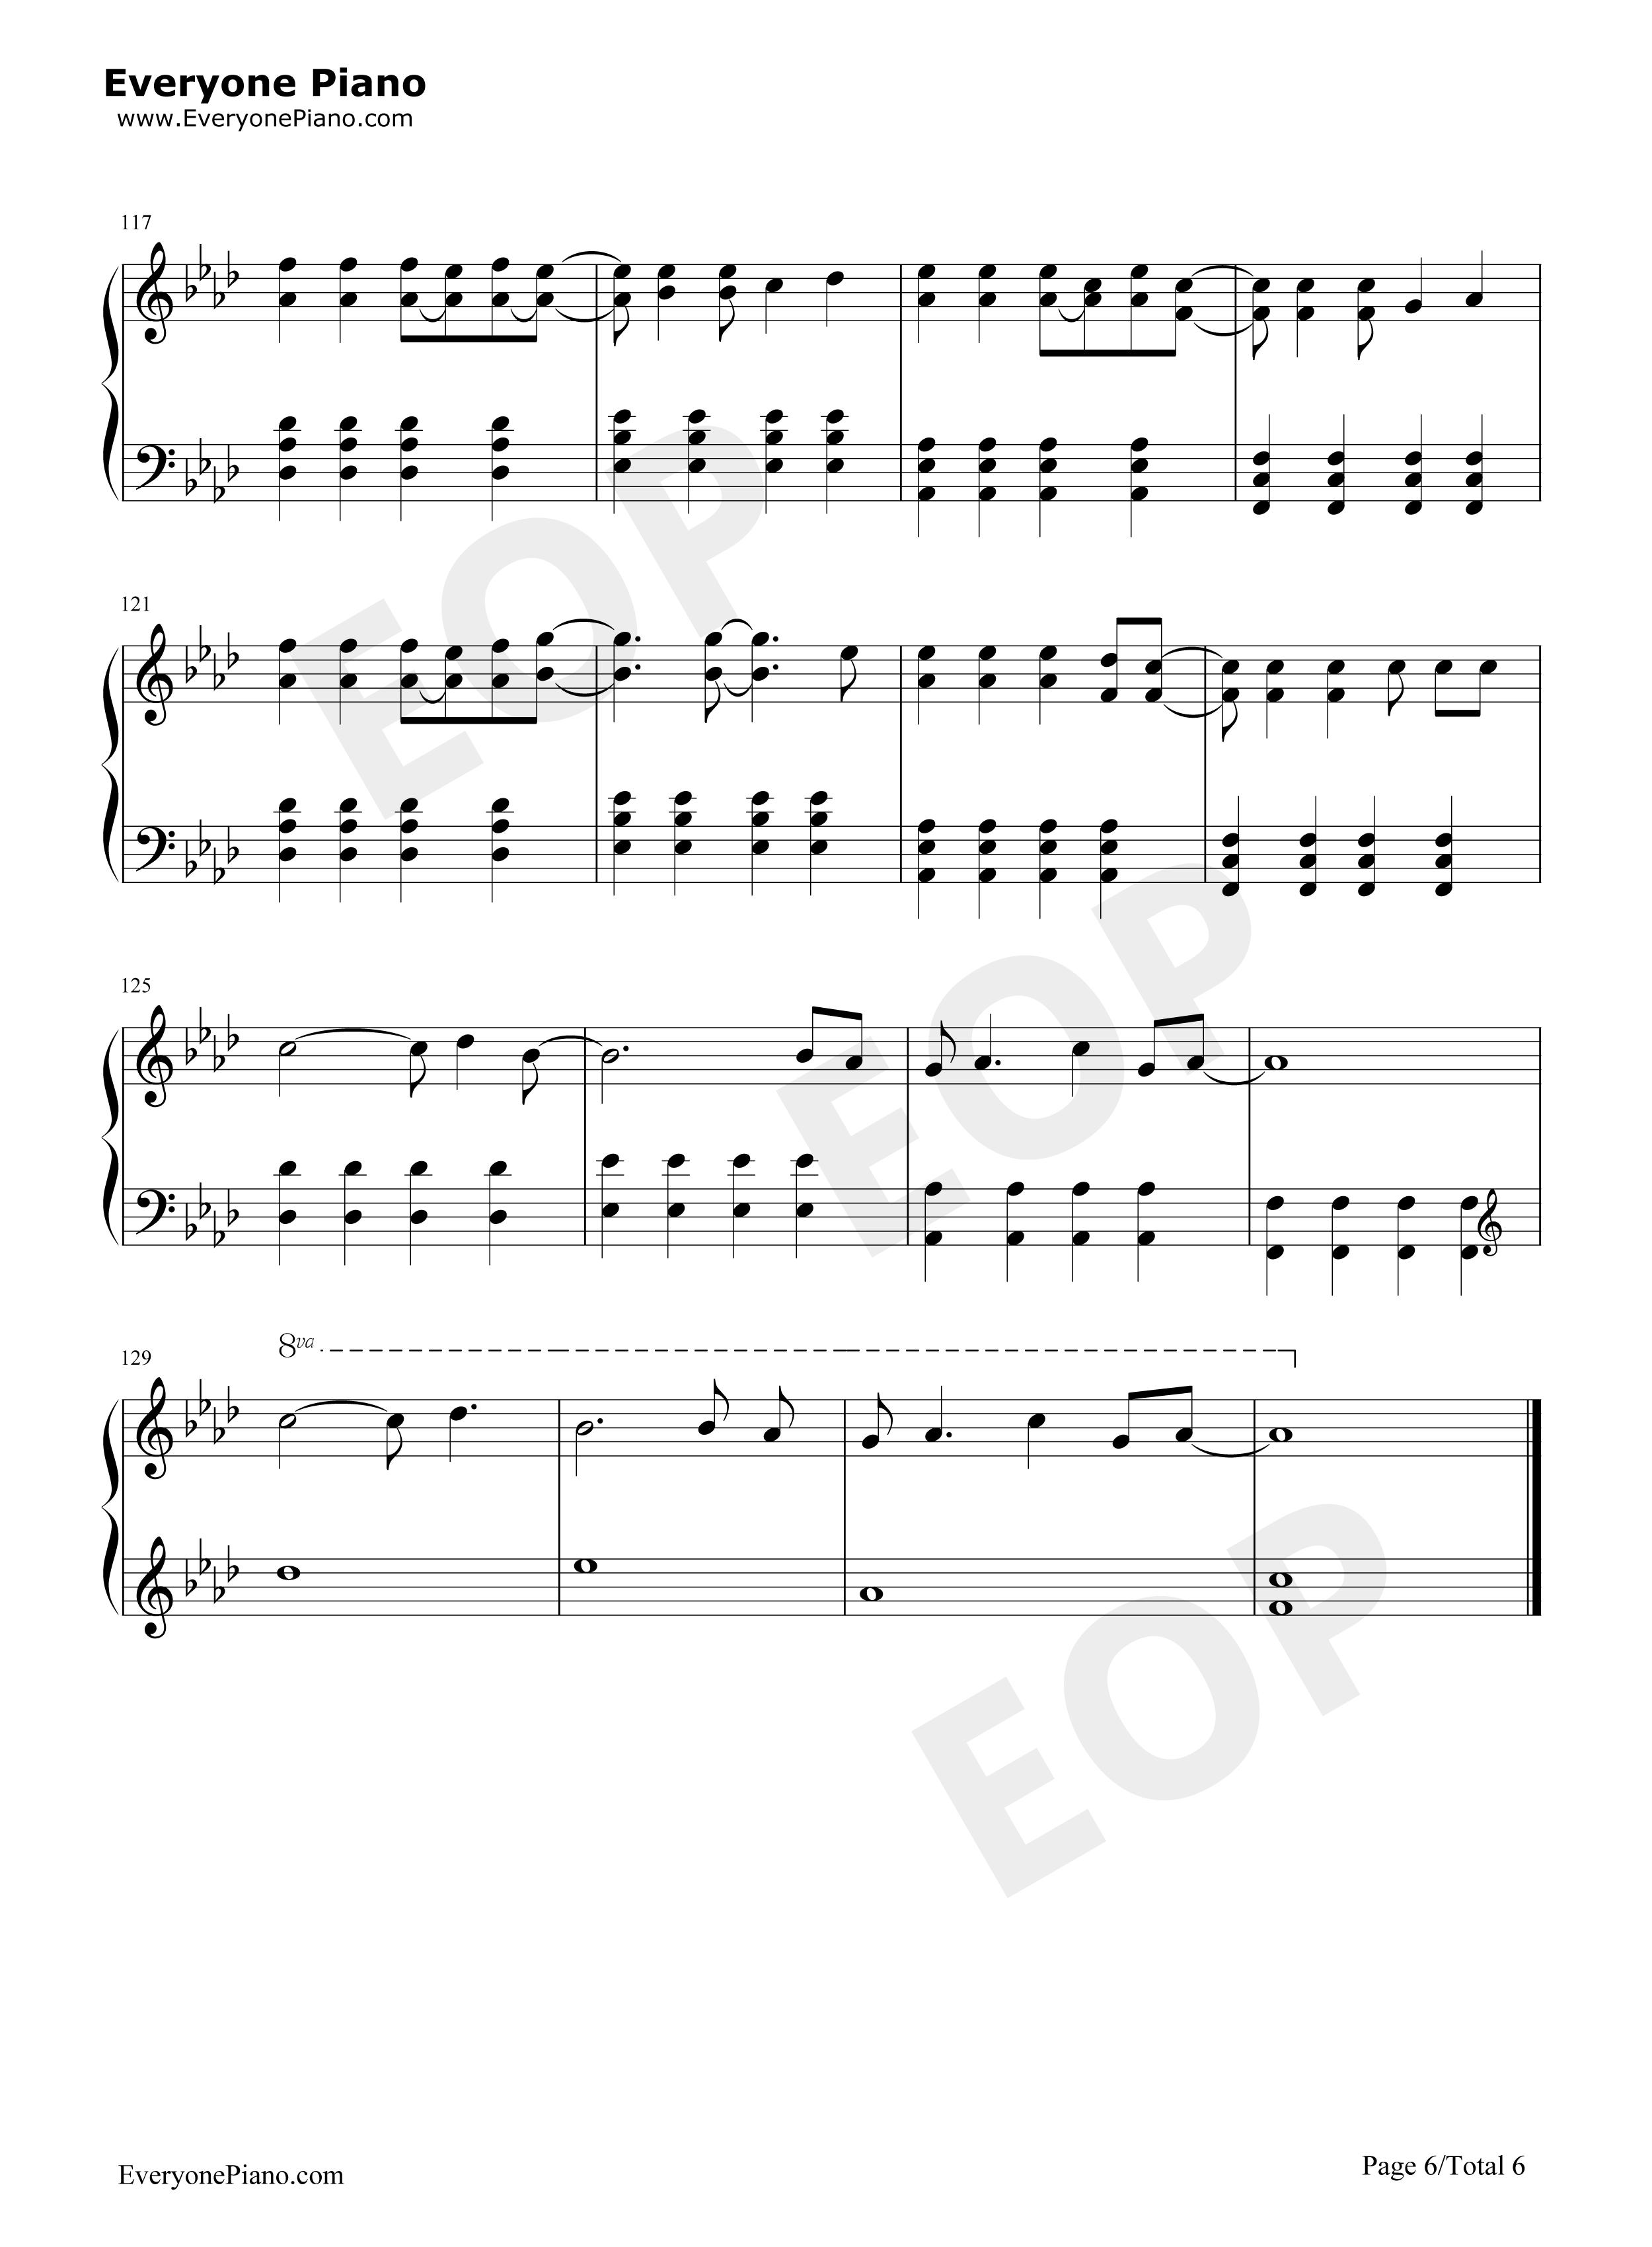 Viva la vida free piano sheet music piano chords viva la vida stave preview 6 hexwebz Choice Image